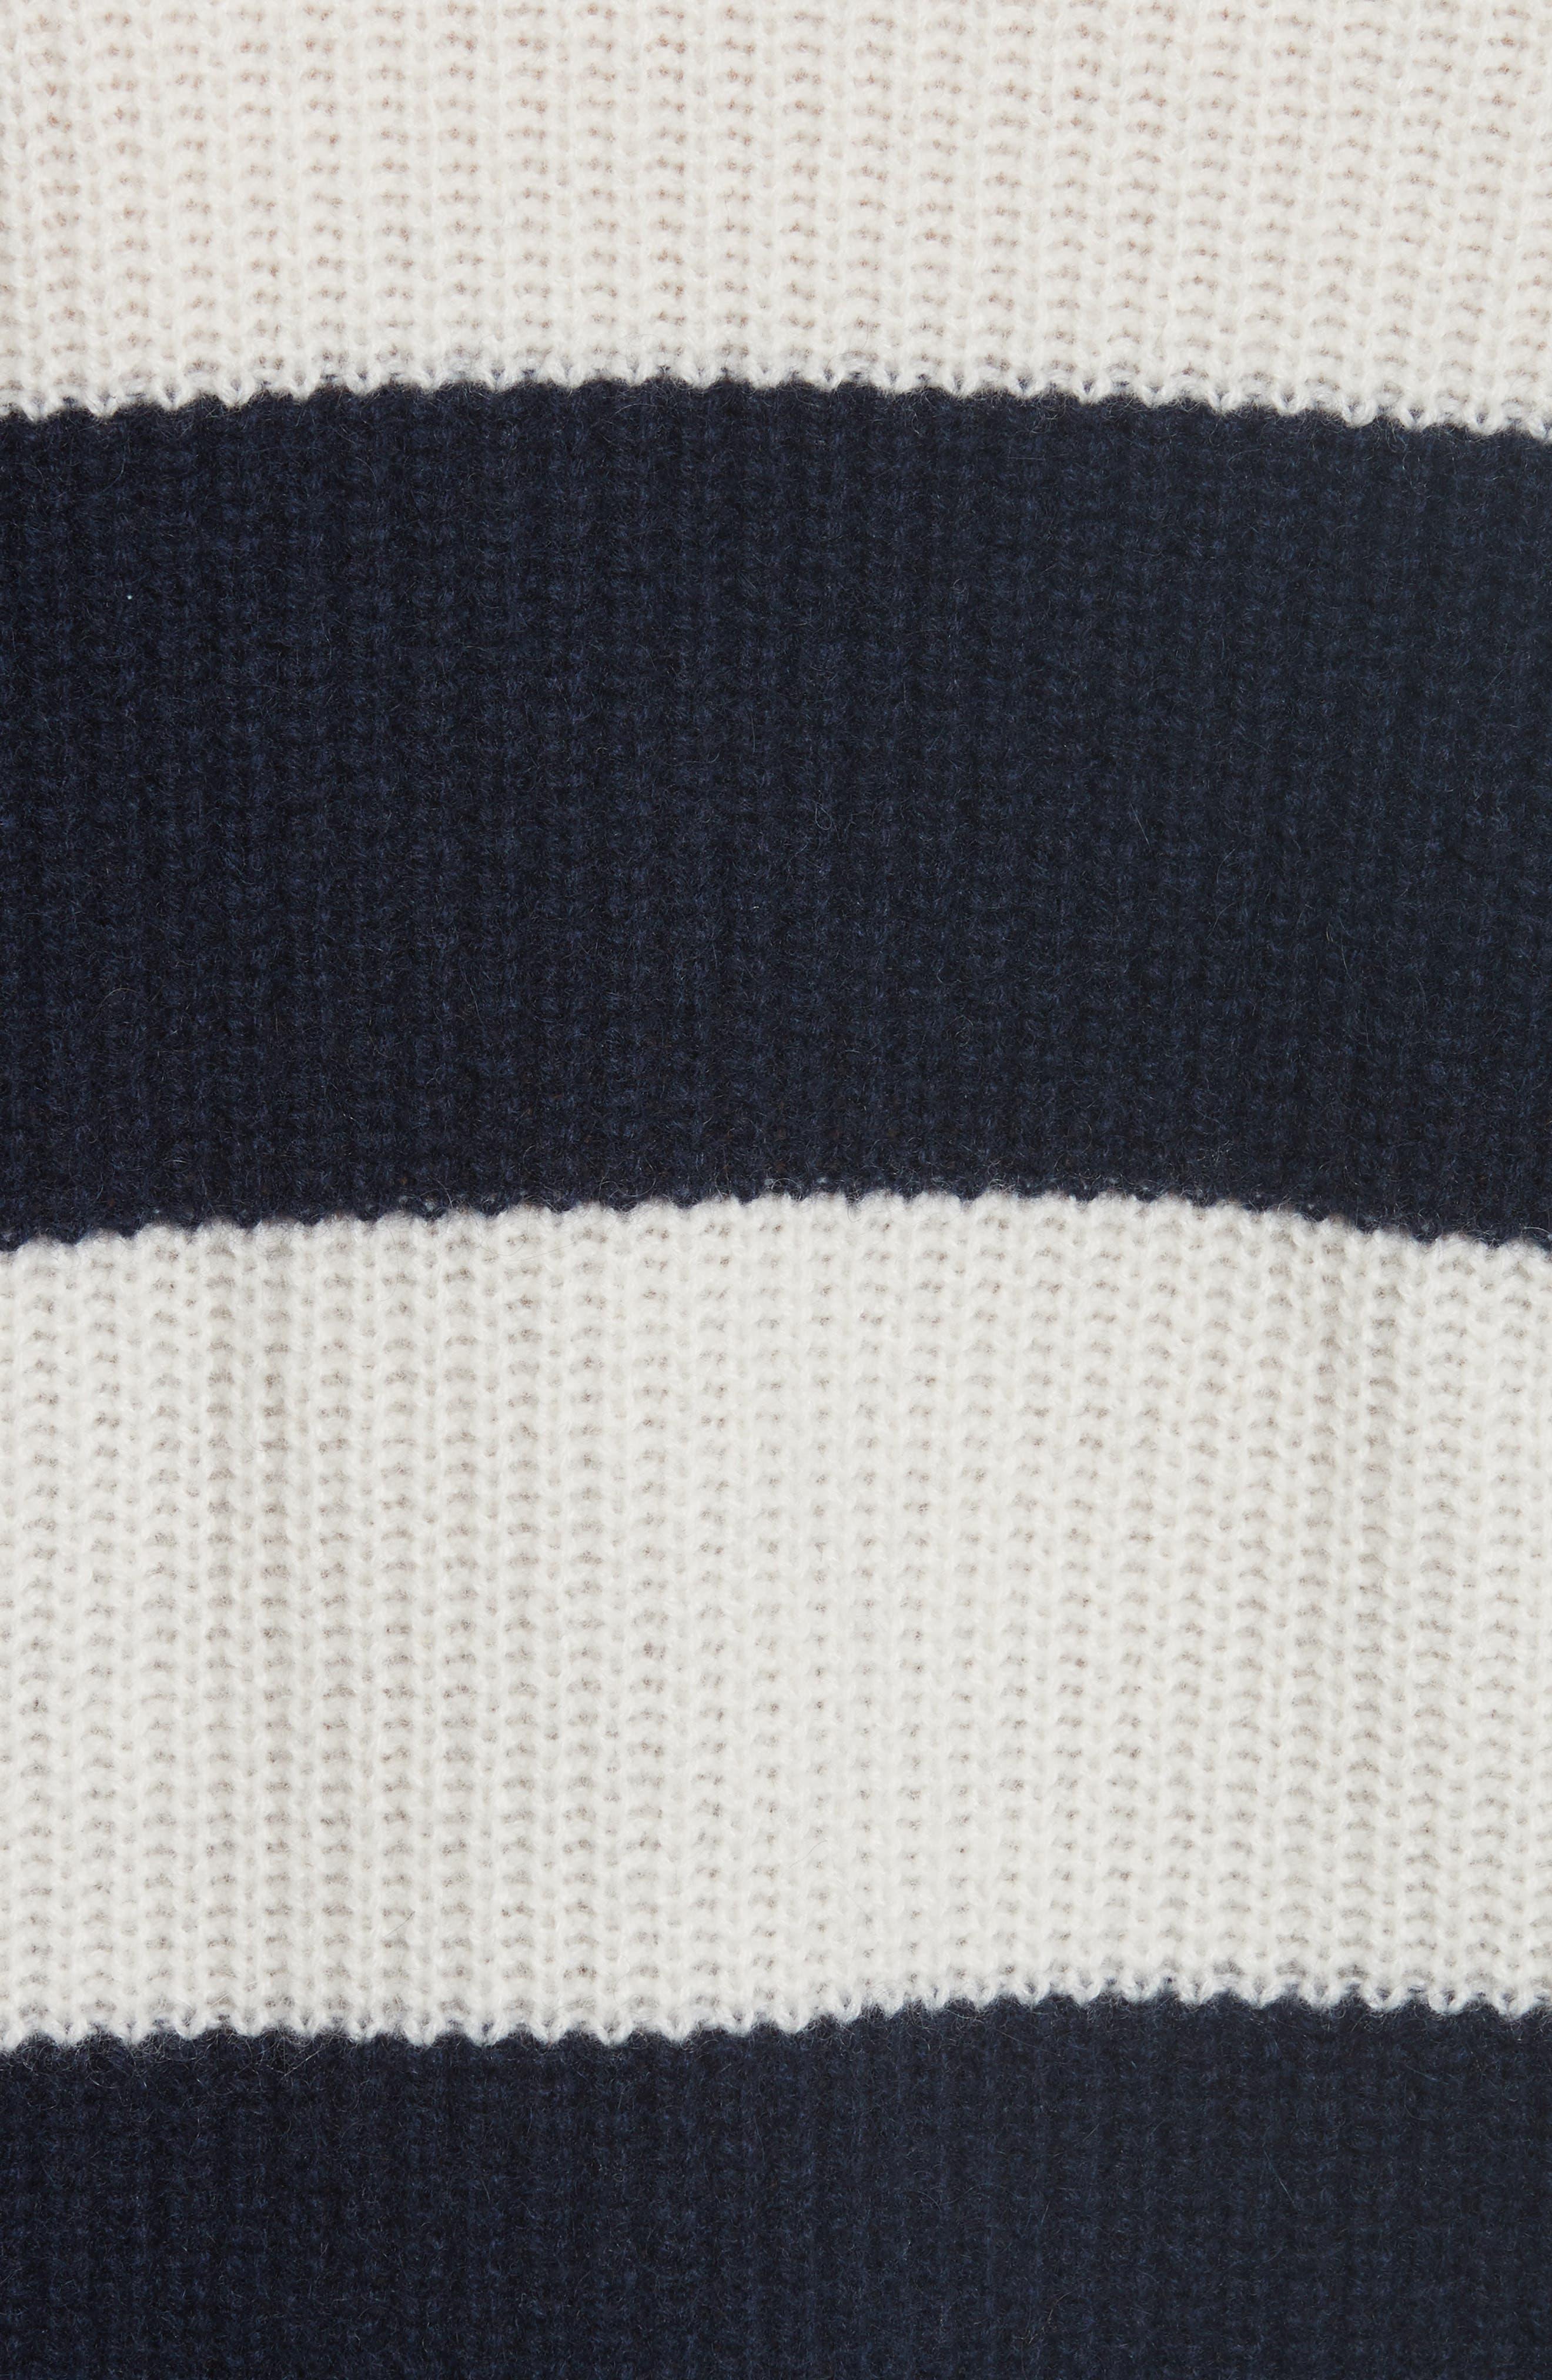 Cashmere Stripe Sweater,                             Alternate thumbnail 5, color,                             902